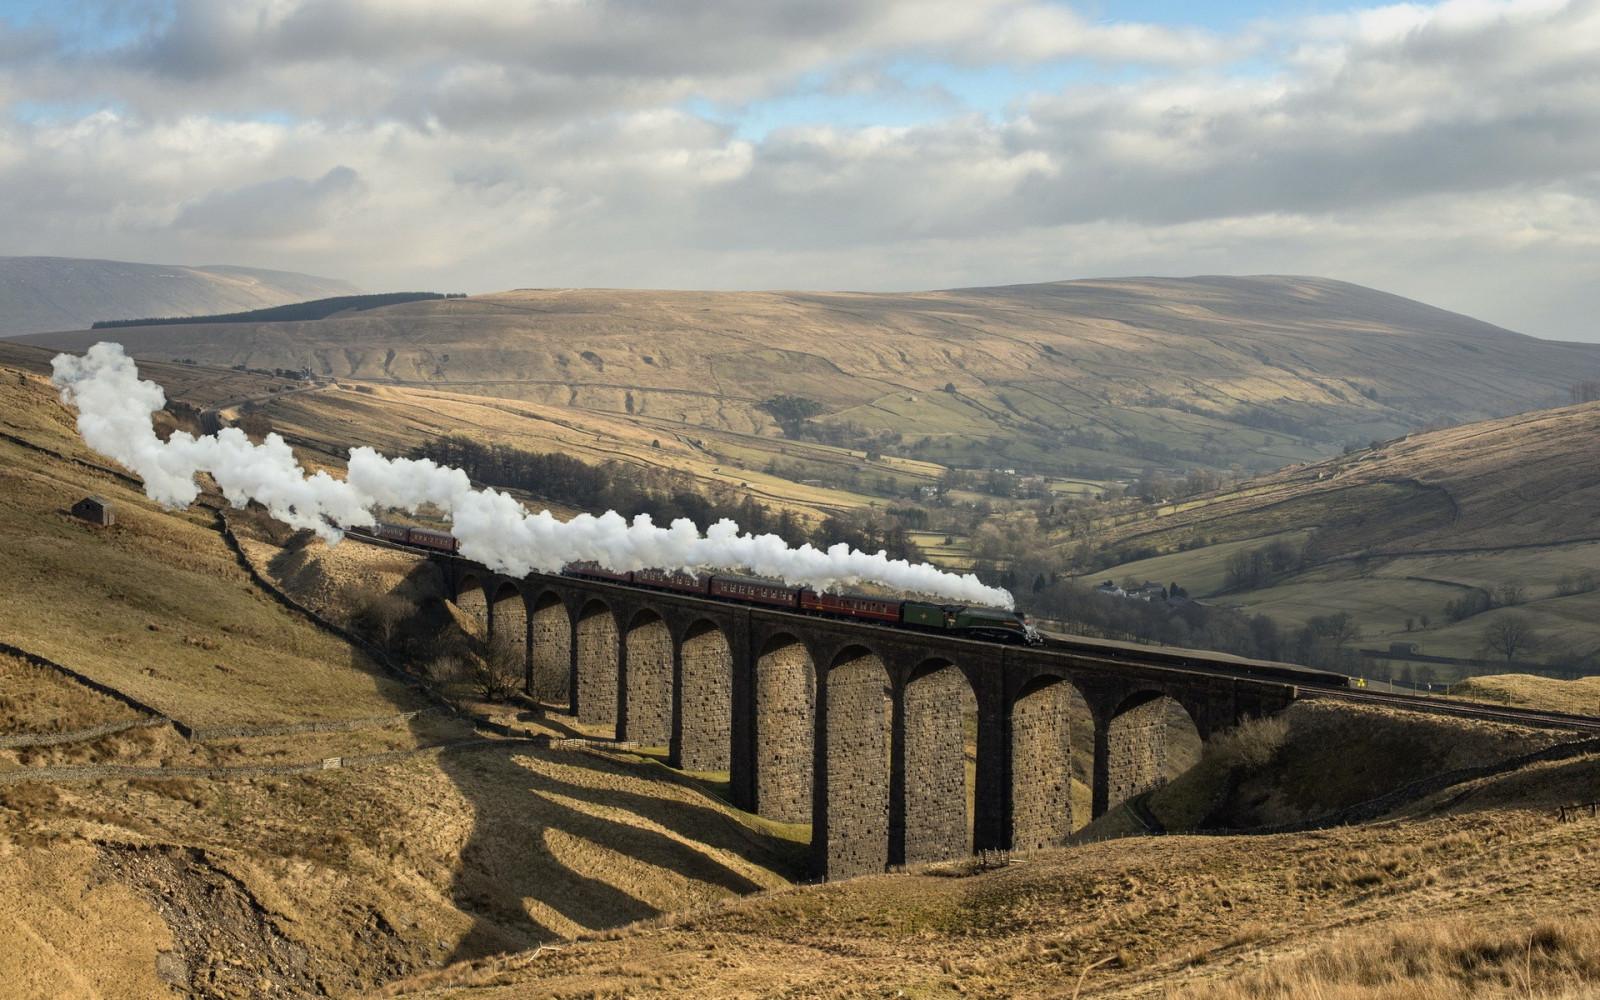 Good Wallpaper Harry Potter Nature - 1920x1200_px_Arch_bricks_bridge_clouds_field_Harry_Potter_Hill-791483  Best Photo Reference_82766.jpg!d